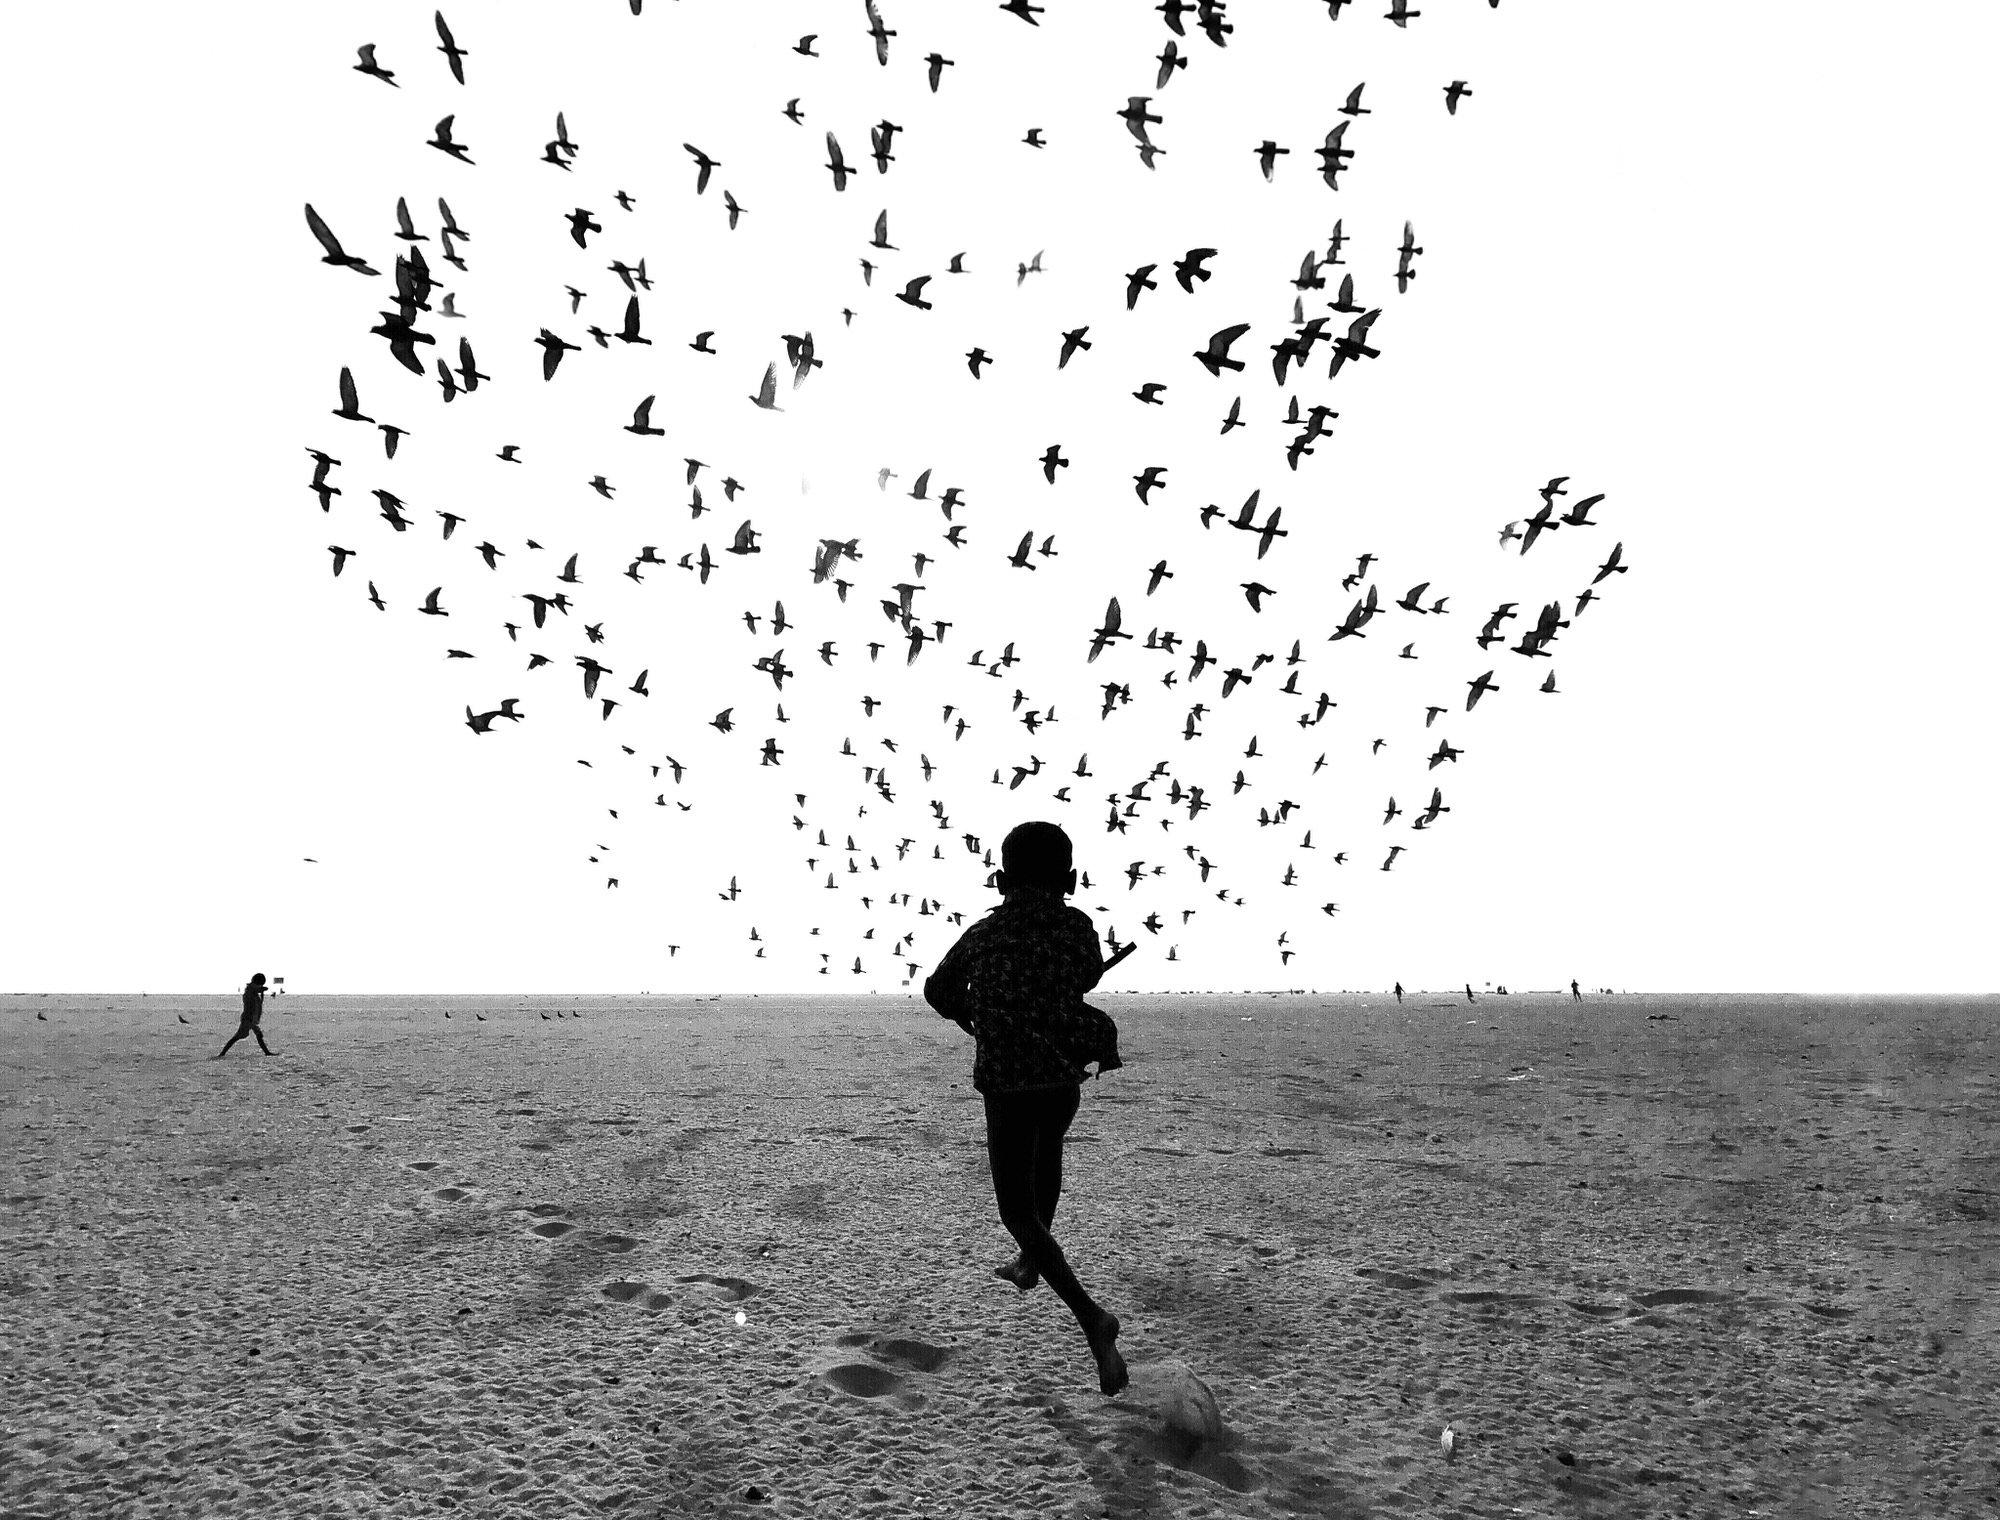 Dimpy Bhalotia的黑白摄影